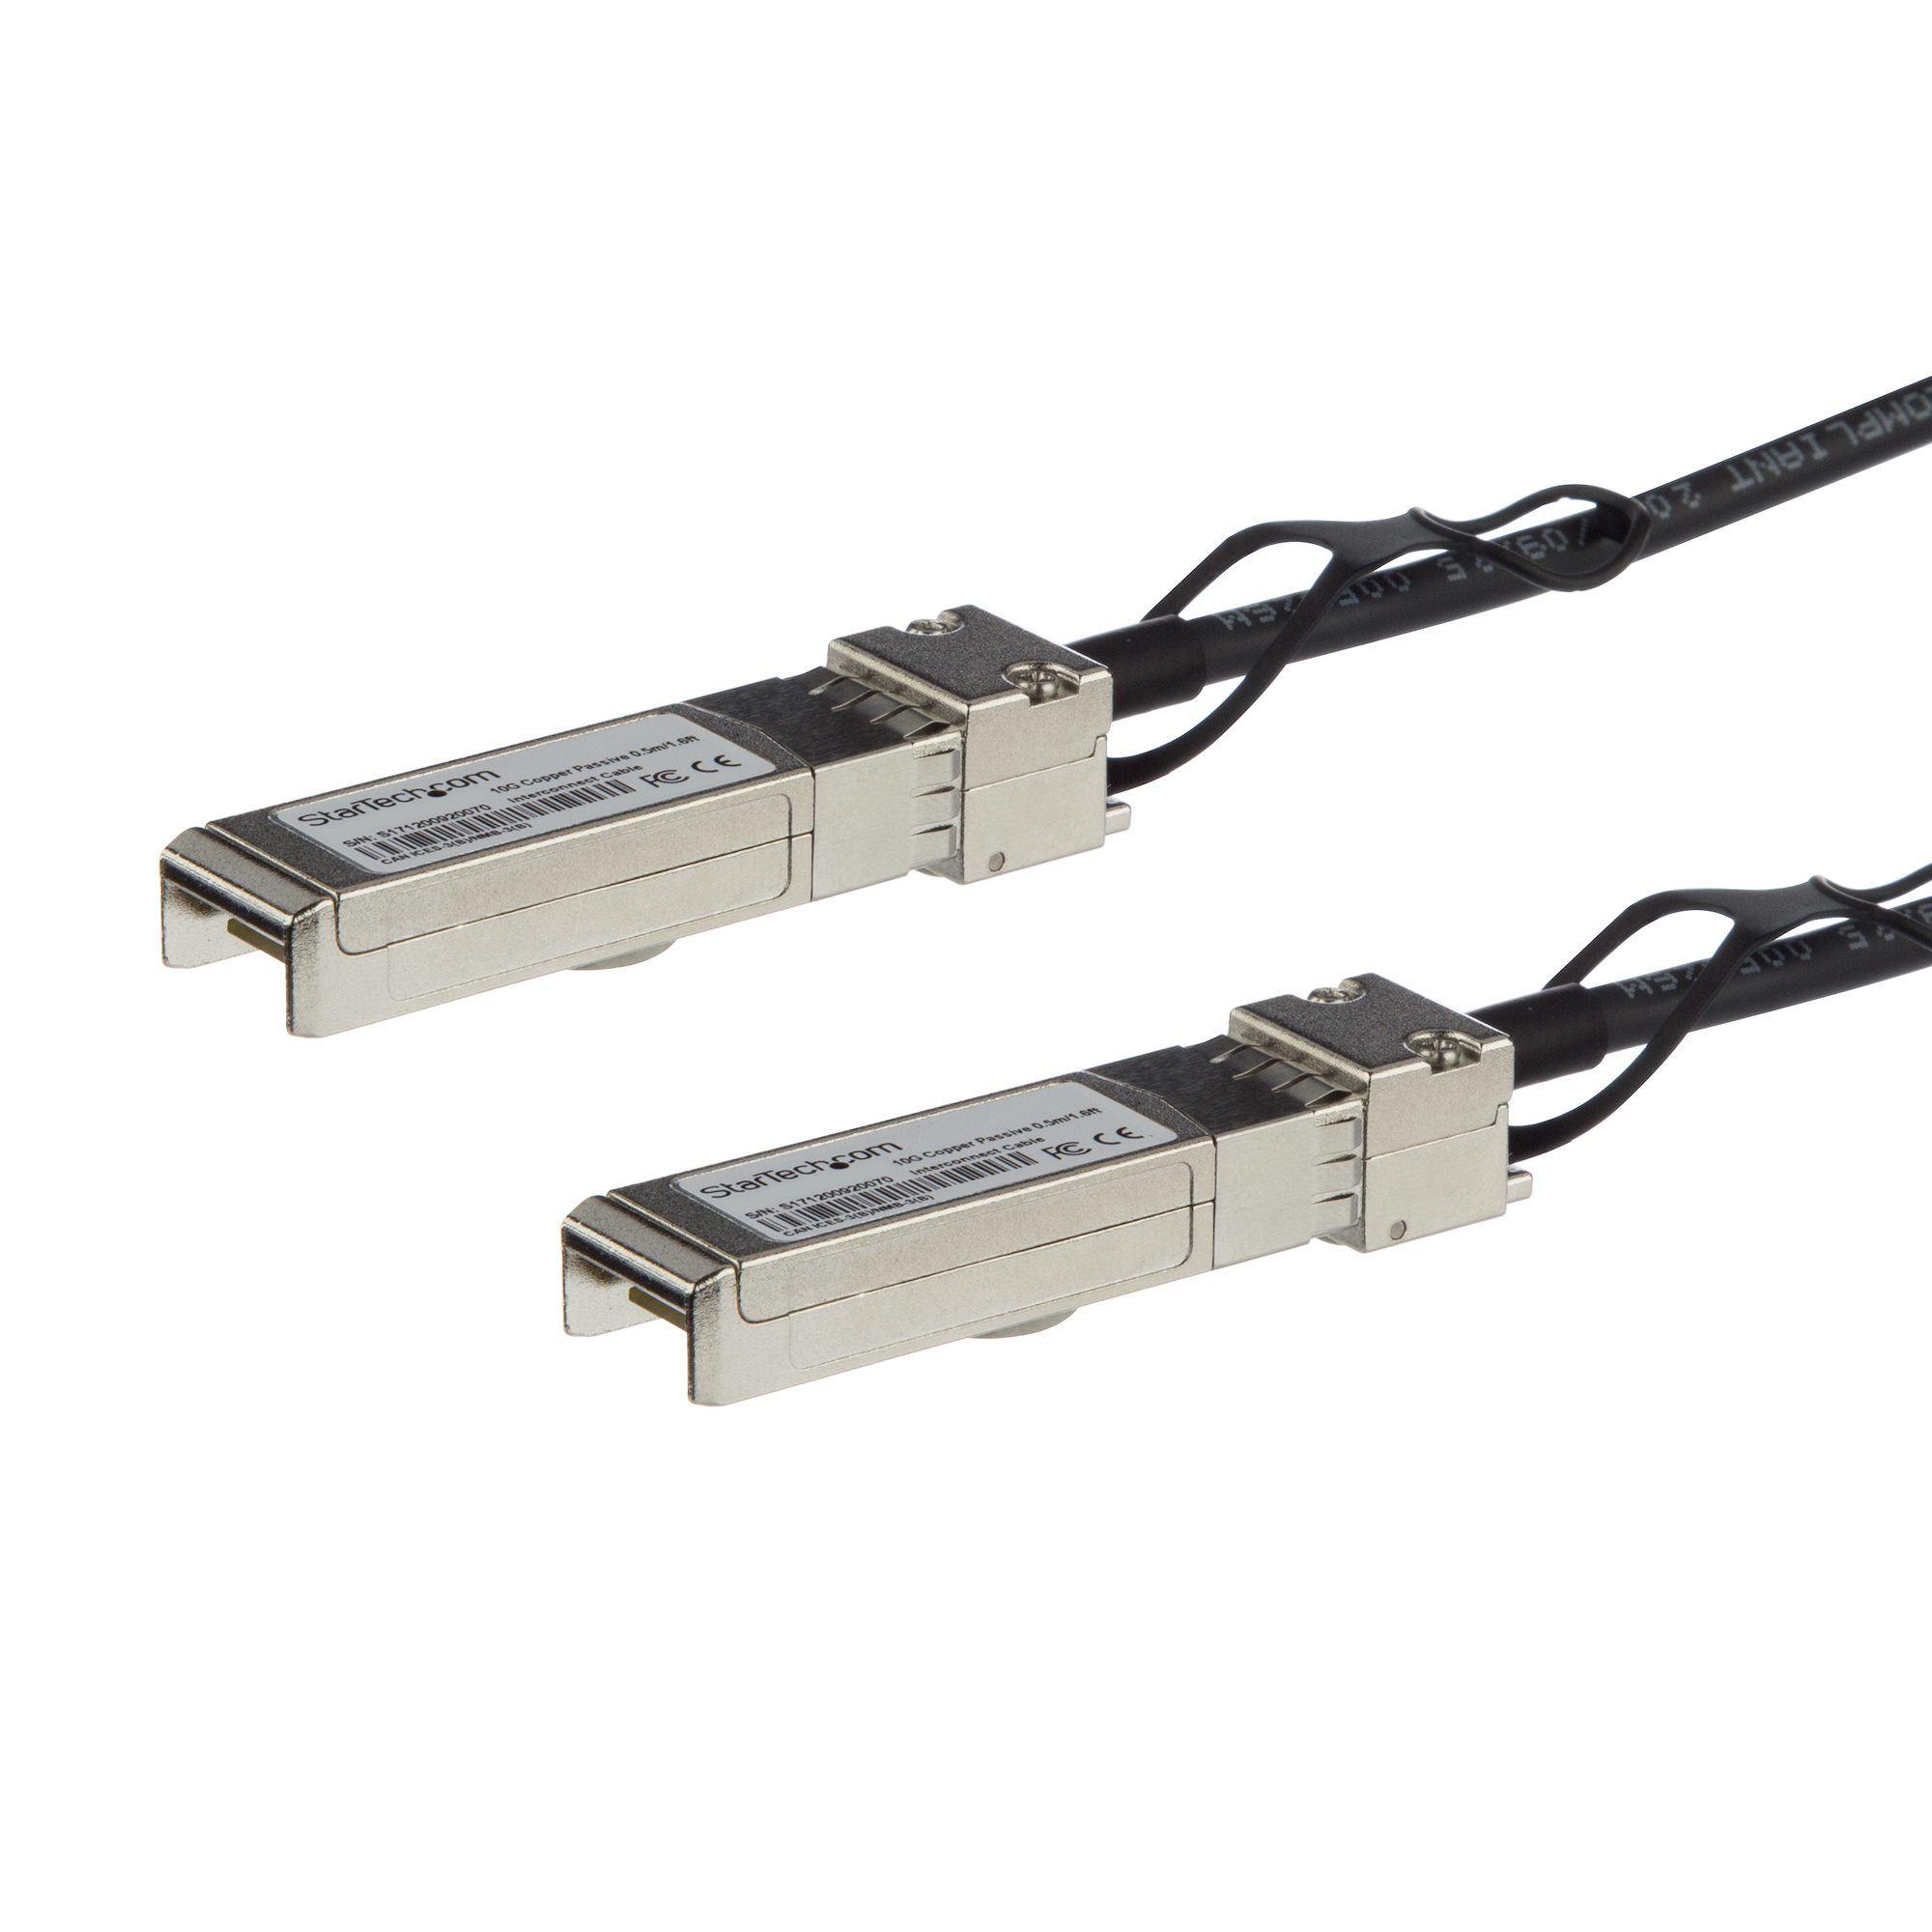 2465436-StarTech-com-Cisco-SFP-H10GB-CU2-5M-Compatibile-Cavo-Modulo-SFP-ad-at